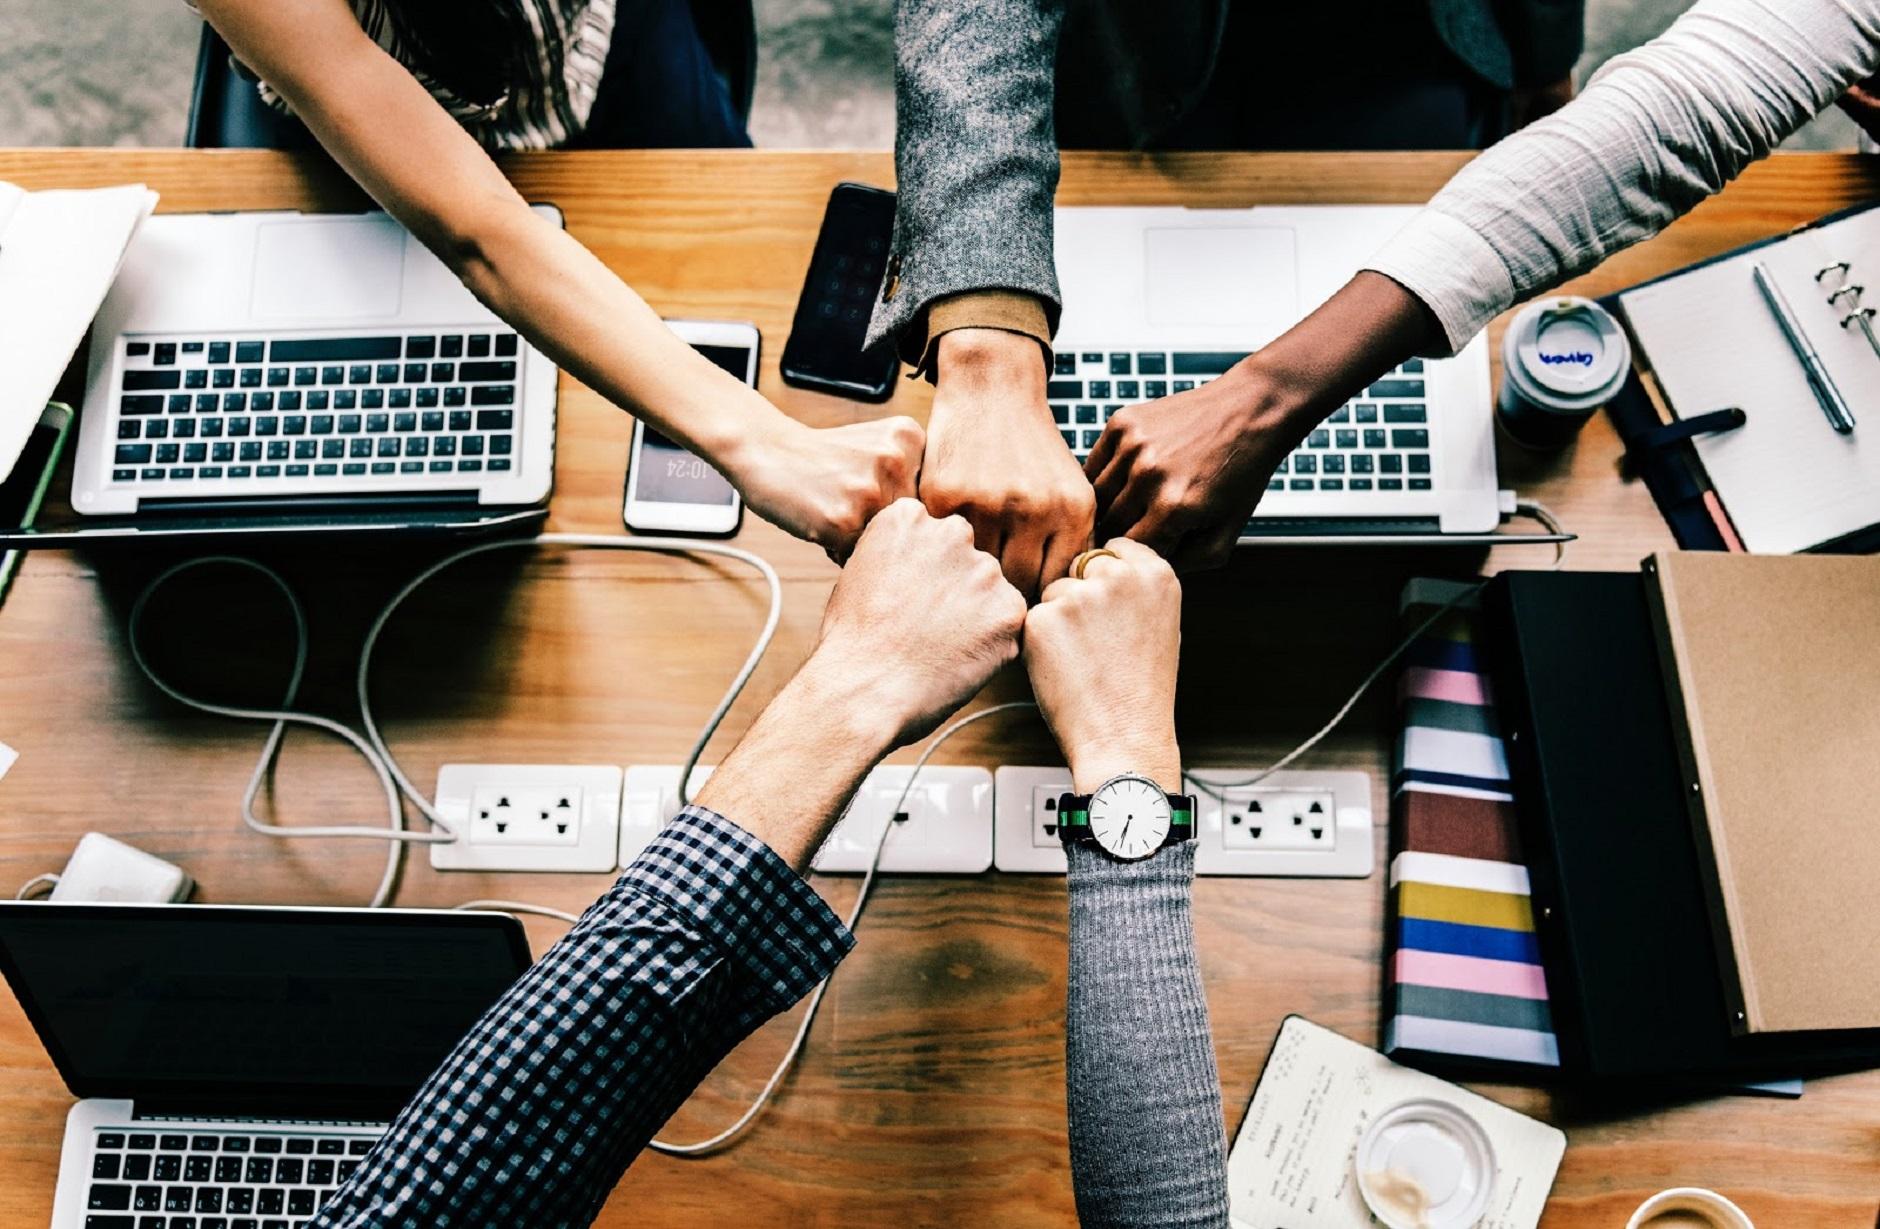 office team collaboration